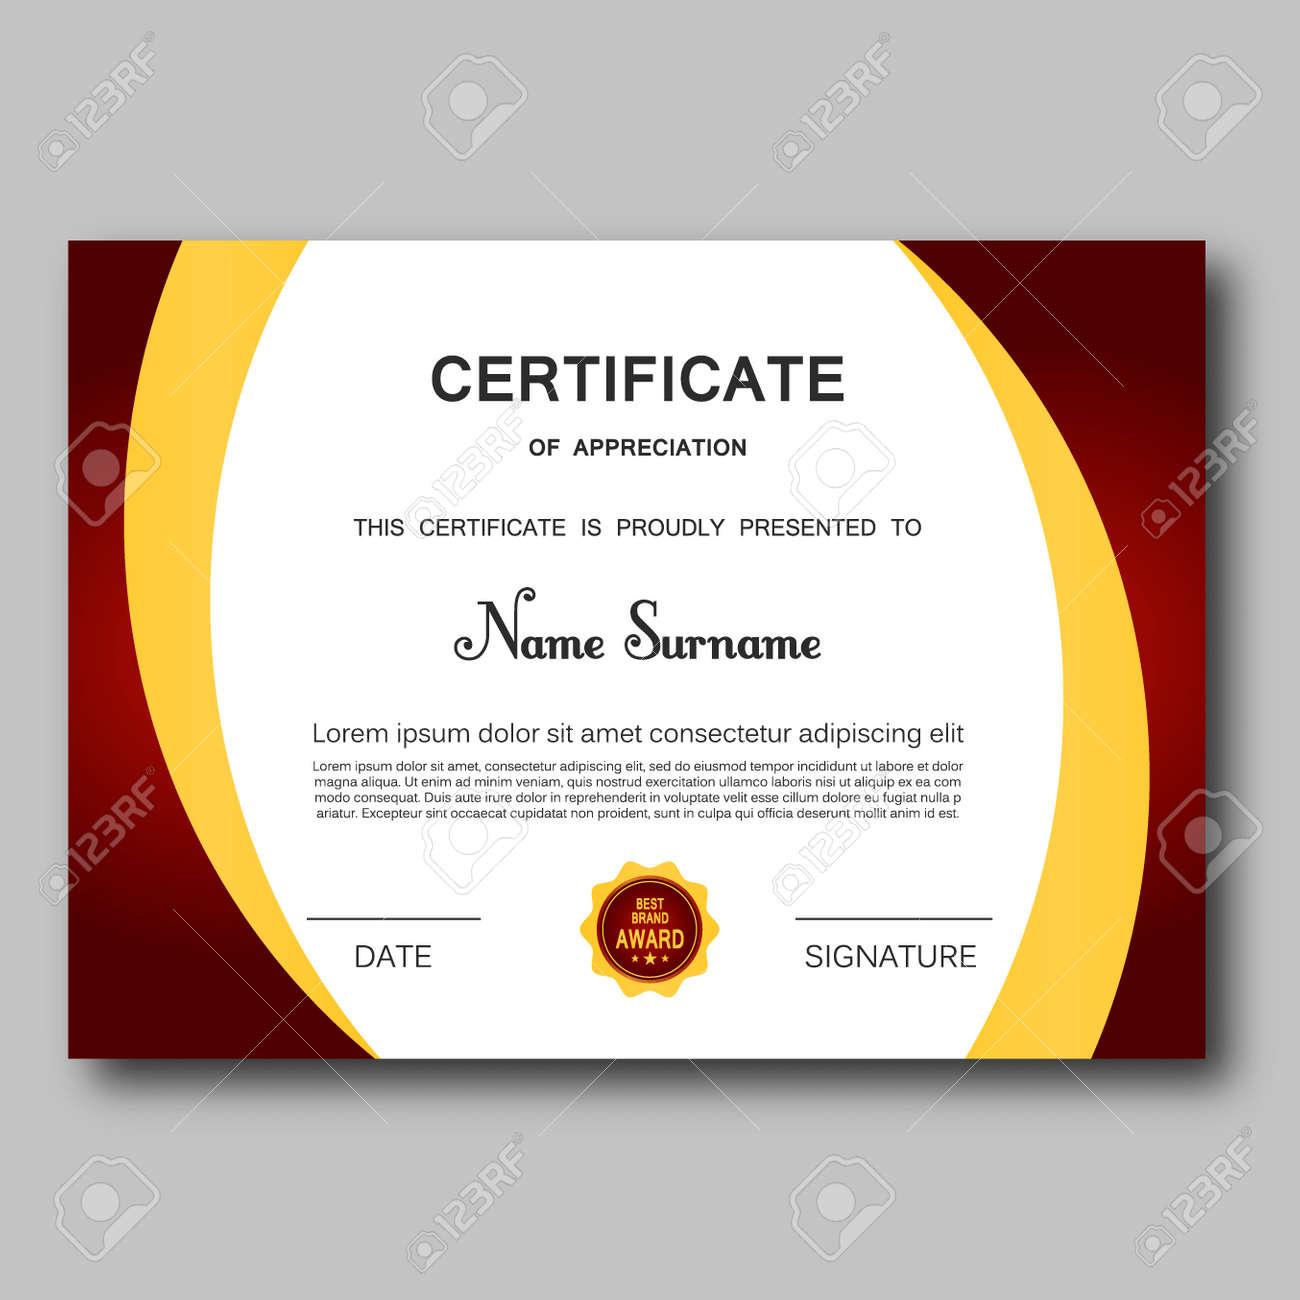 Certificate of appreciation template vector trendy geometric certificate of appreciation template vector trendy geometric design award achievement elegant success diploma business design illustration yadclub Gallery